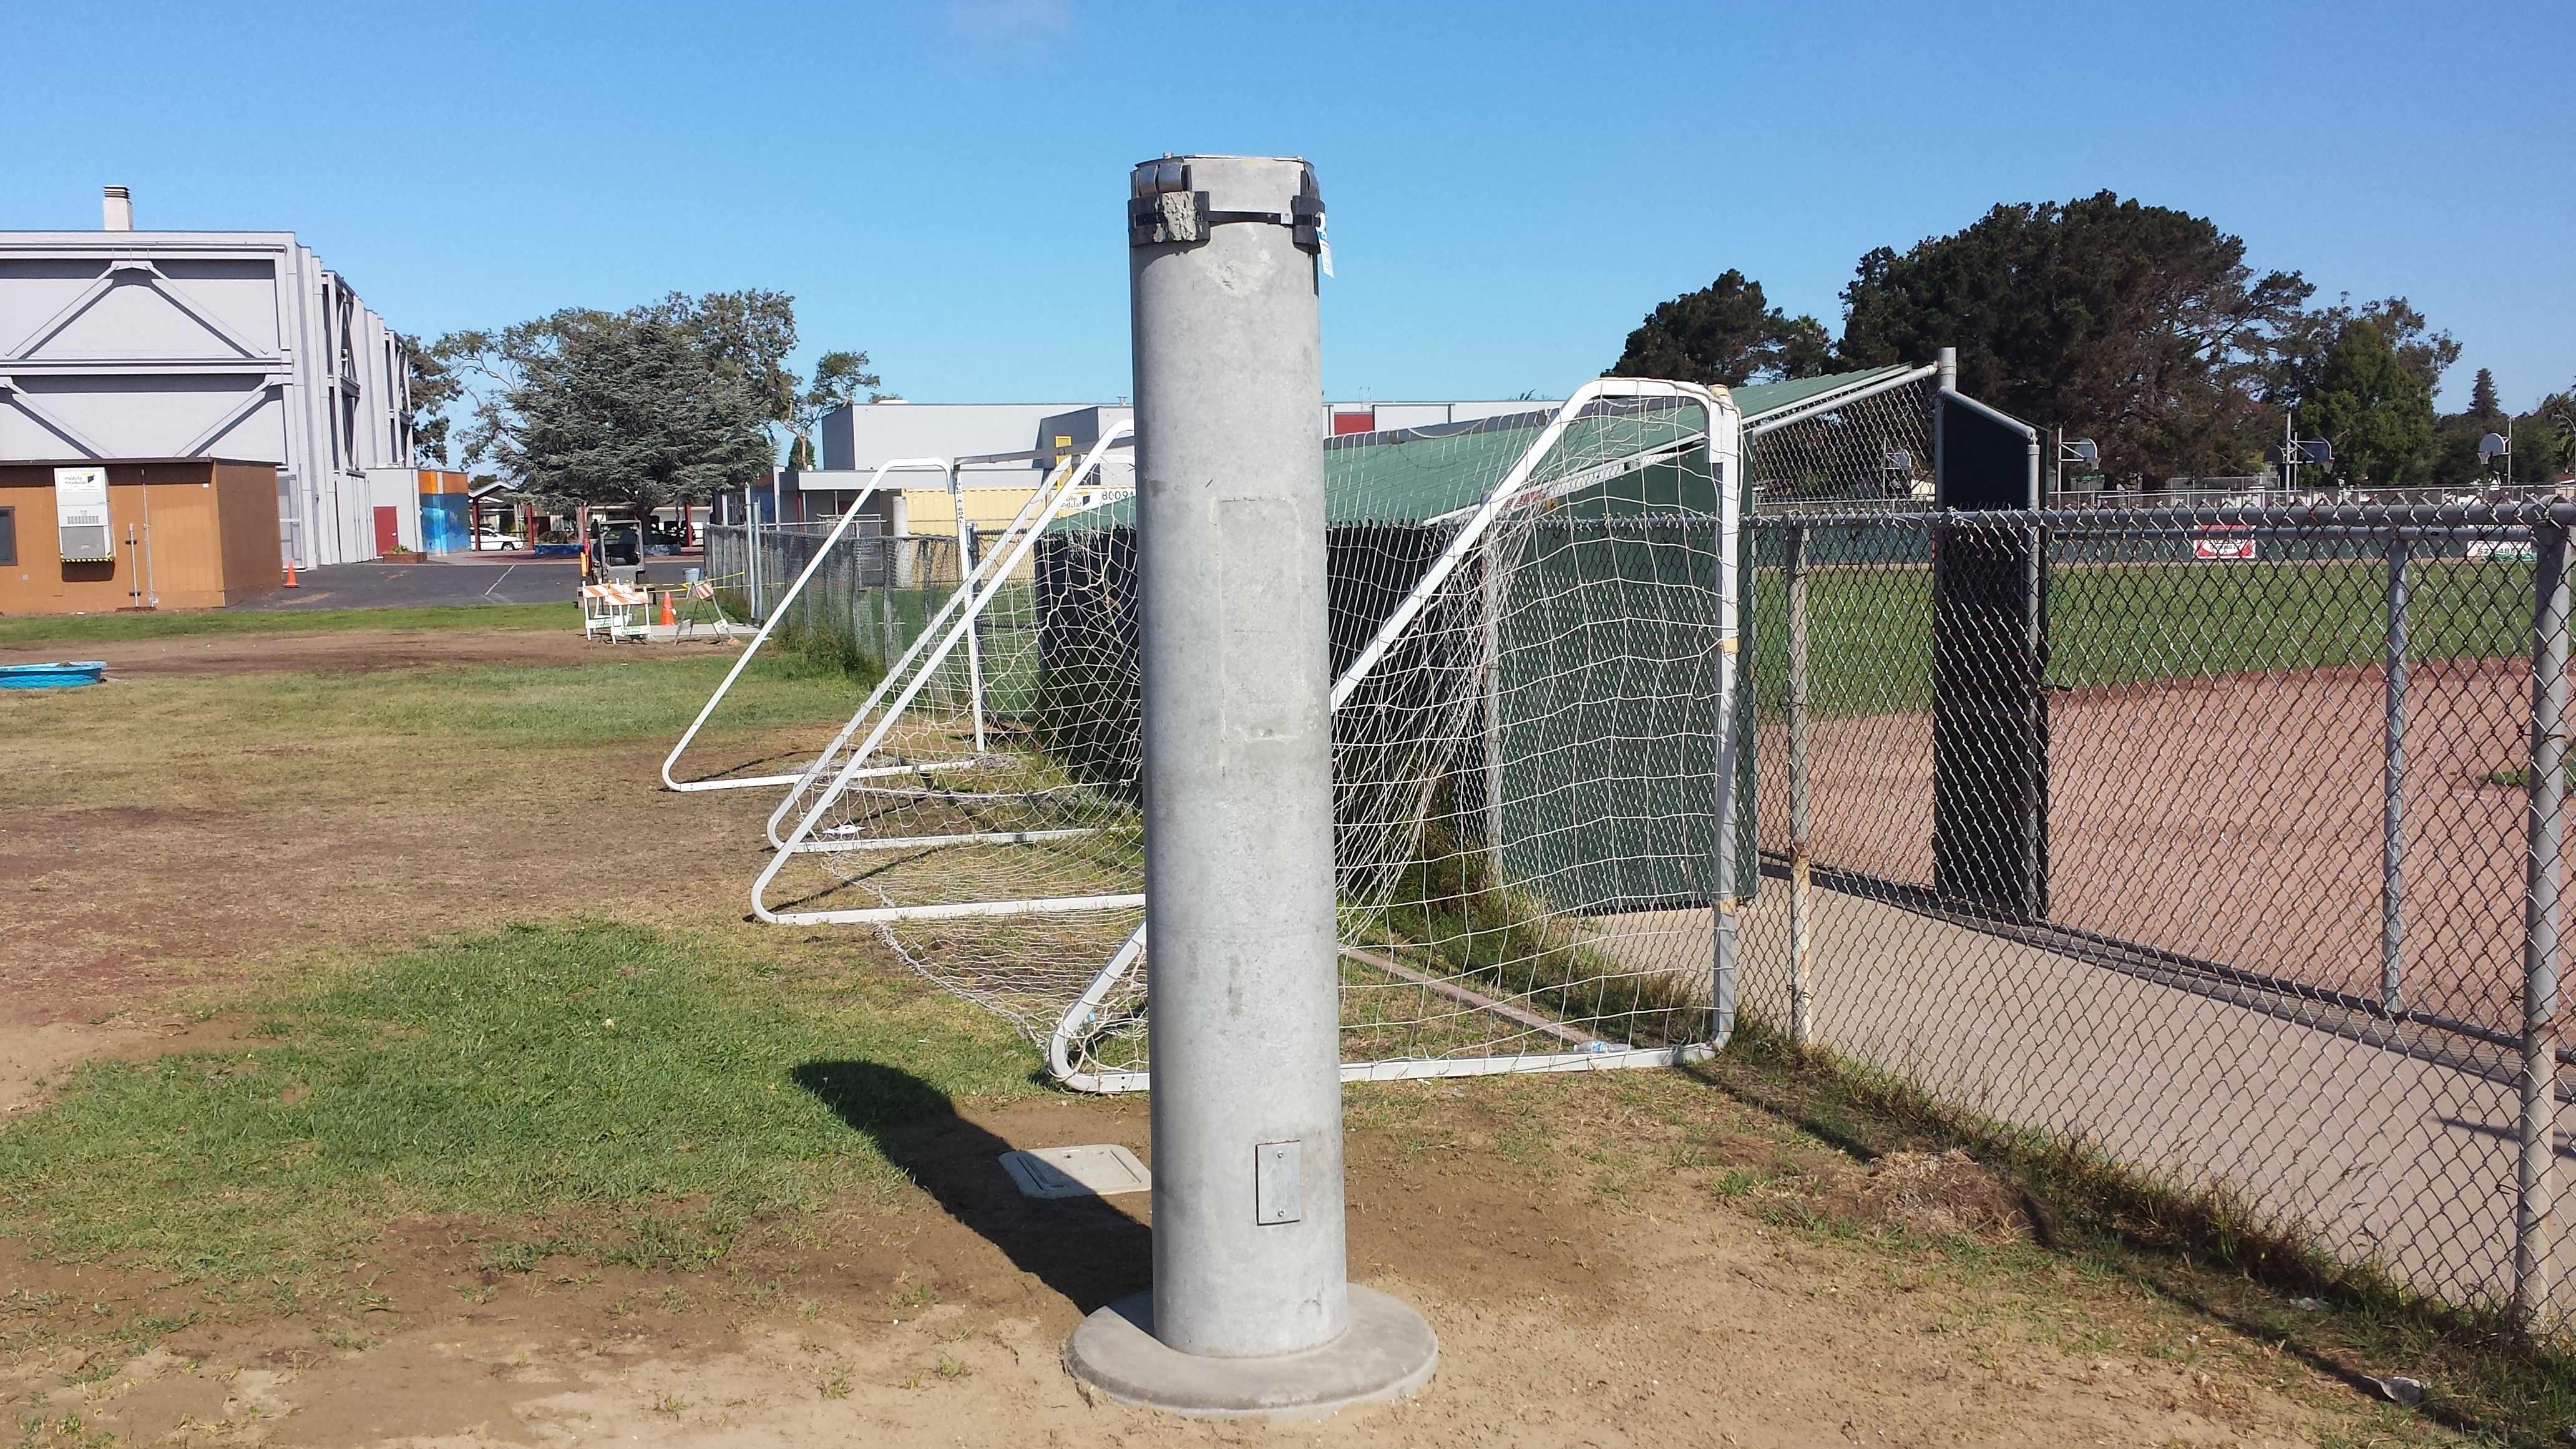 Left Infield Base